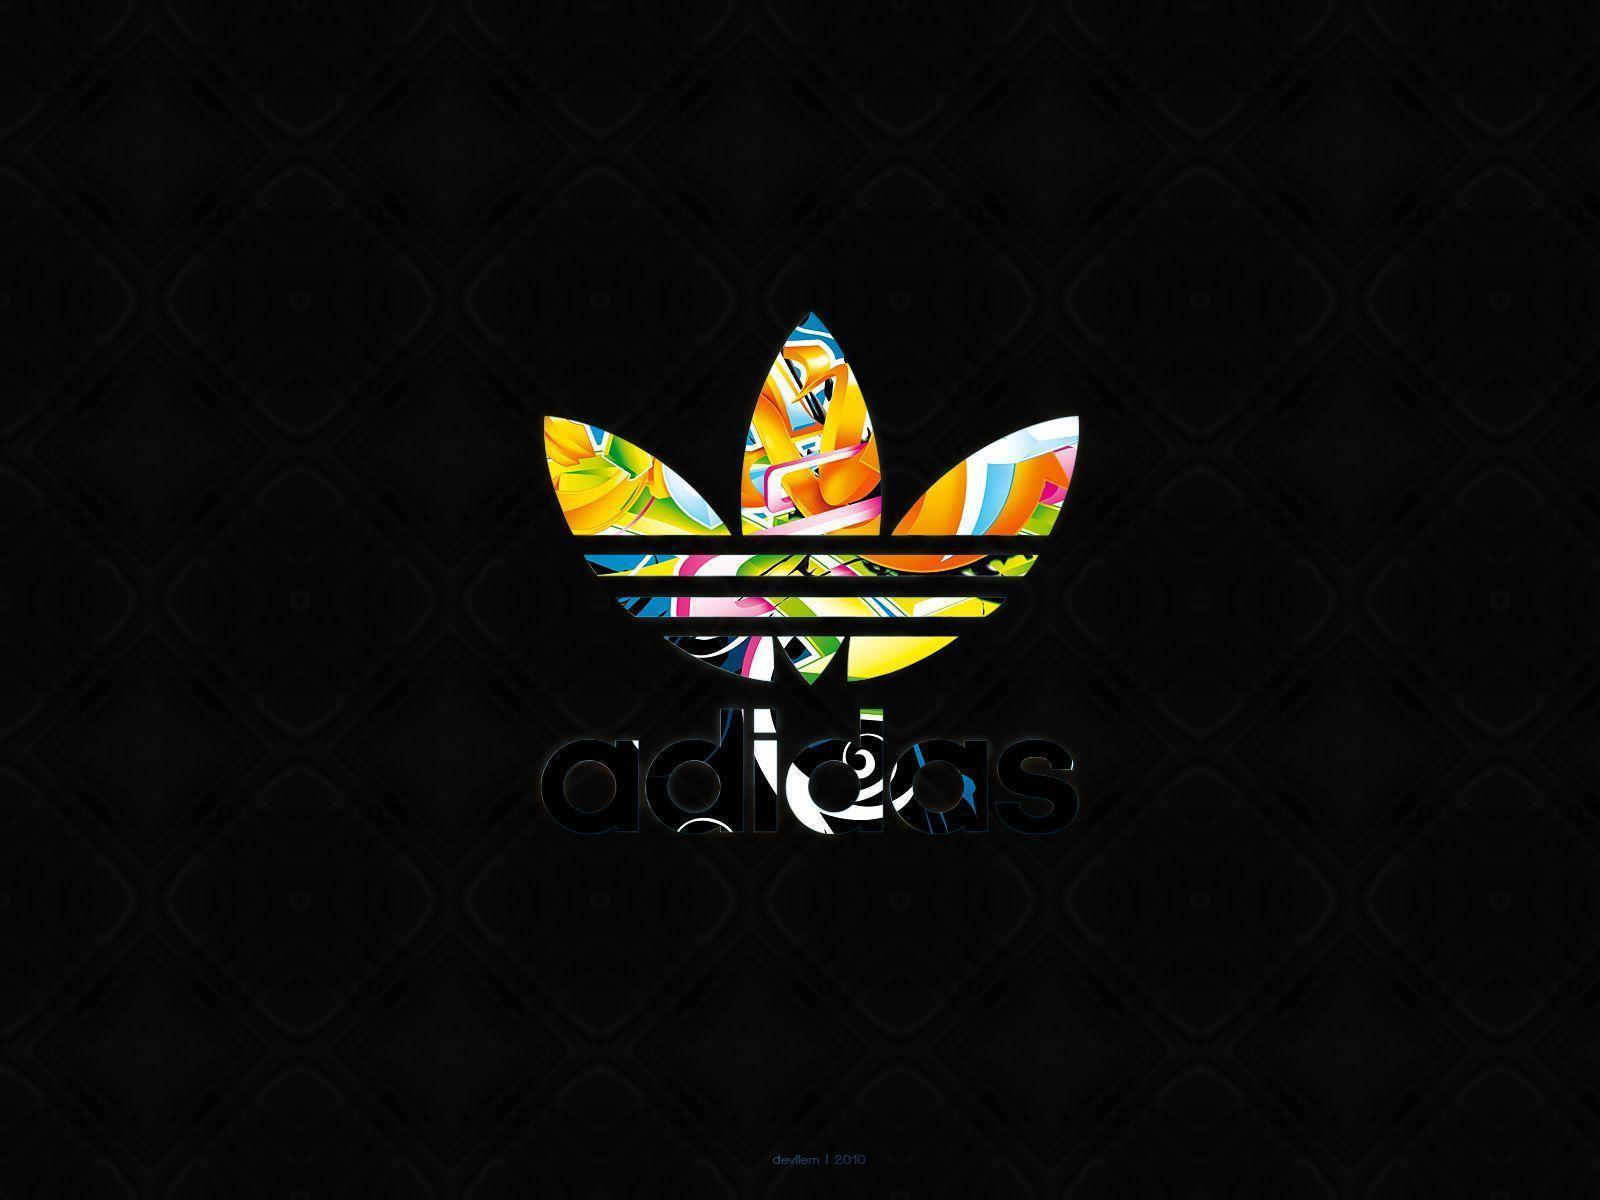 Adidas 2016 Wallpapers Wallpaper Cave